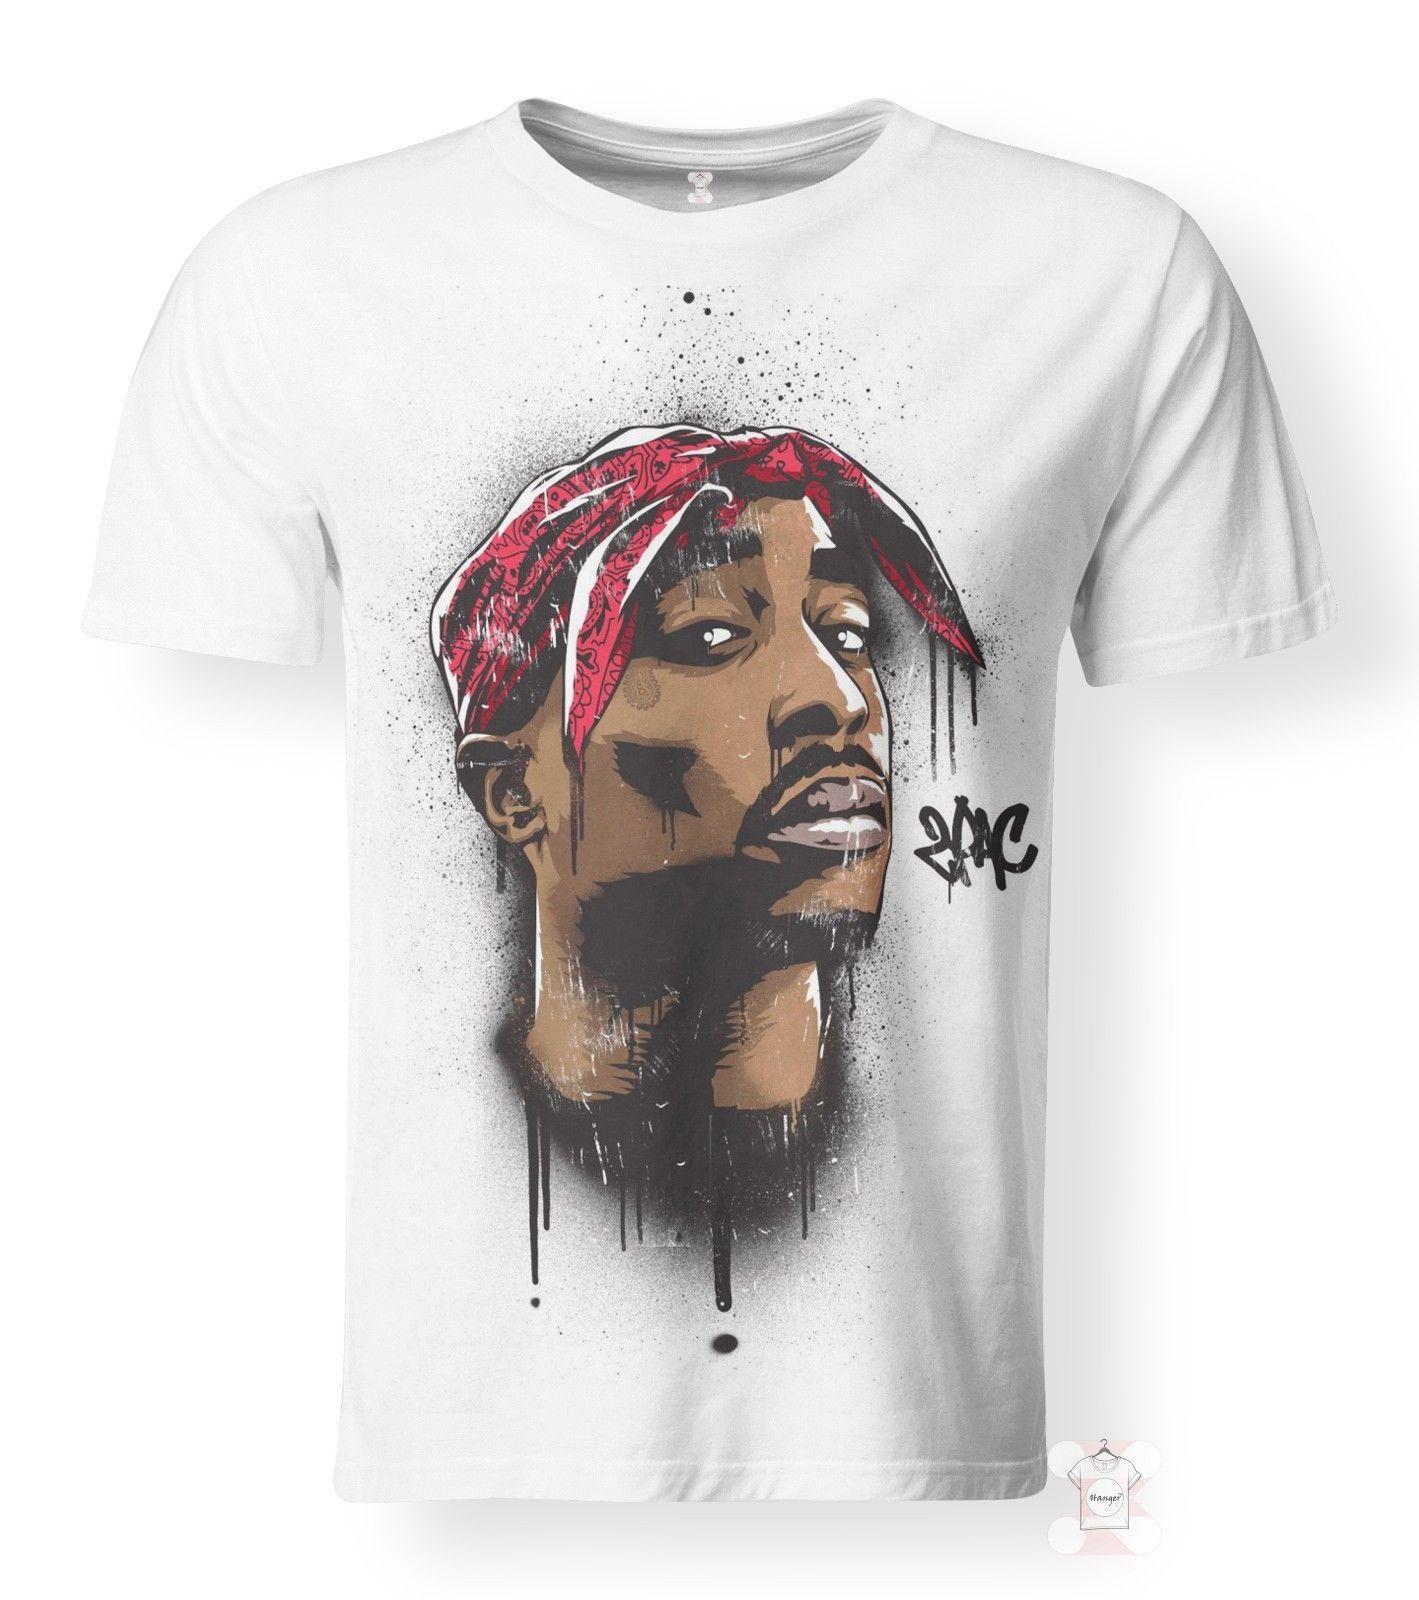 2019 rabatt verkauf größte Auswahl von 2019 große Auswahl an Designs 2Pac T-Shirt Legendary Rapper Tupac Shakur Hip Hop Icon NEW 3D Print Women  Men Men Women Unisex Fashion tshirt Free Shipping